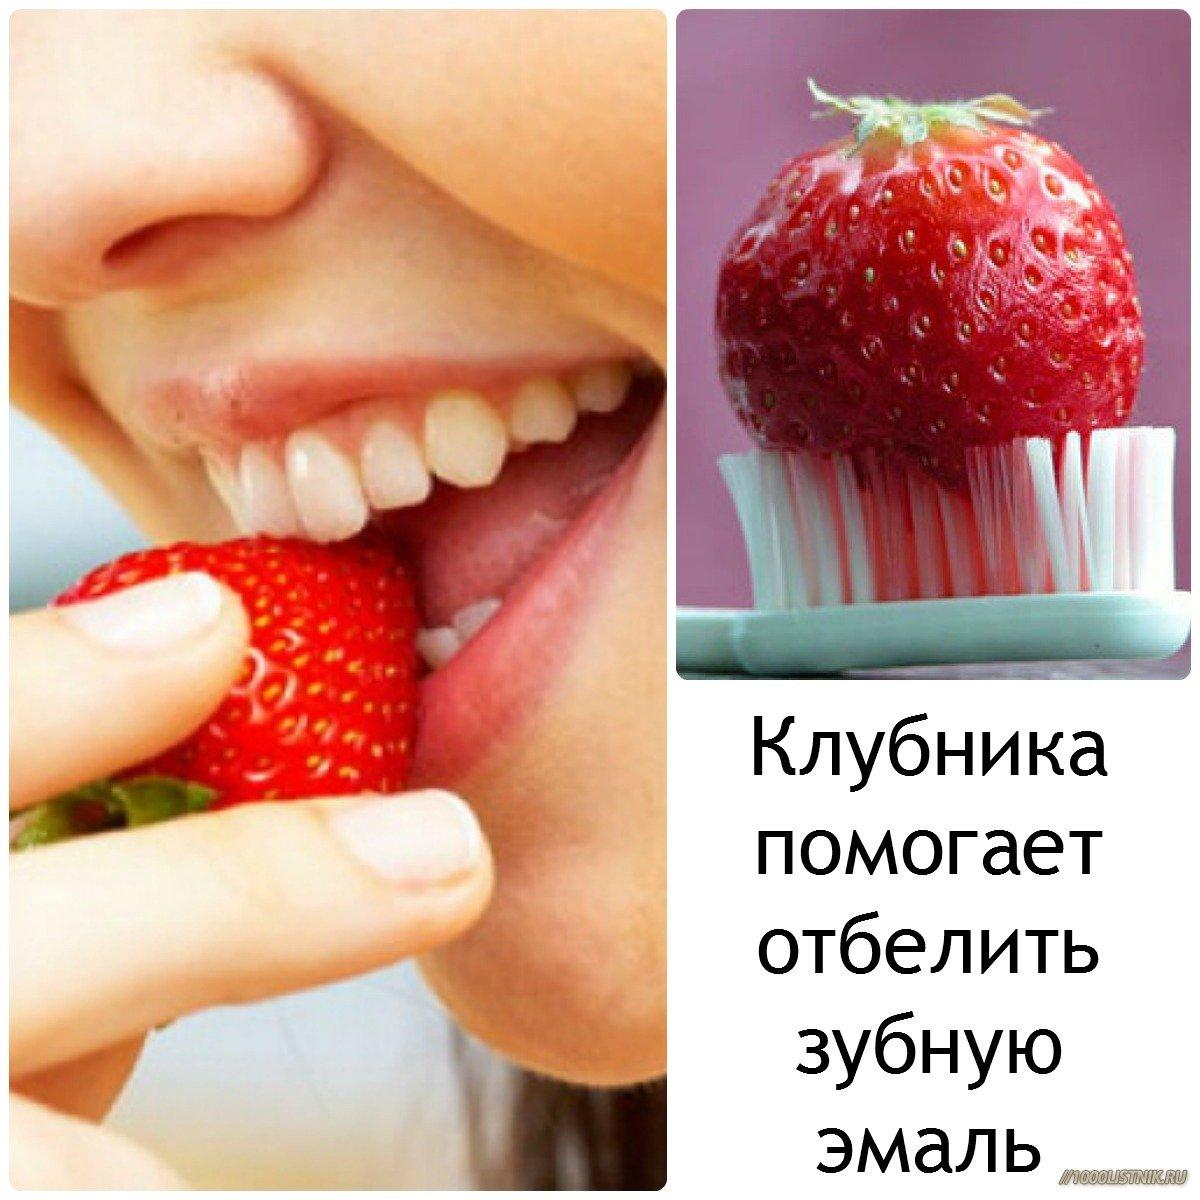 диета после отбеливания зубов zoom